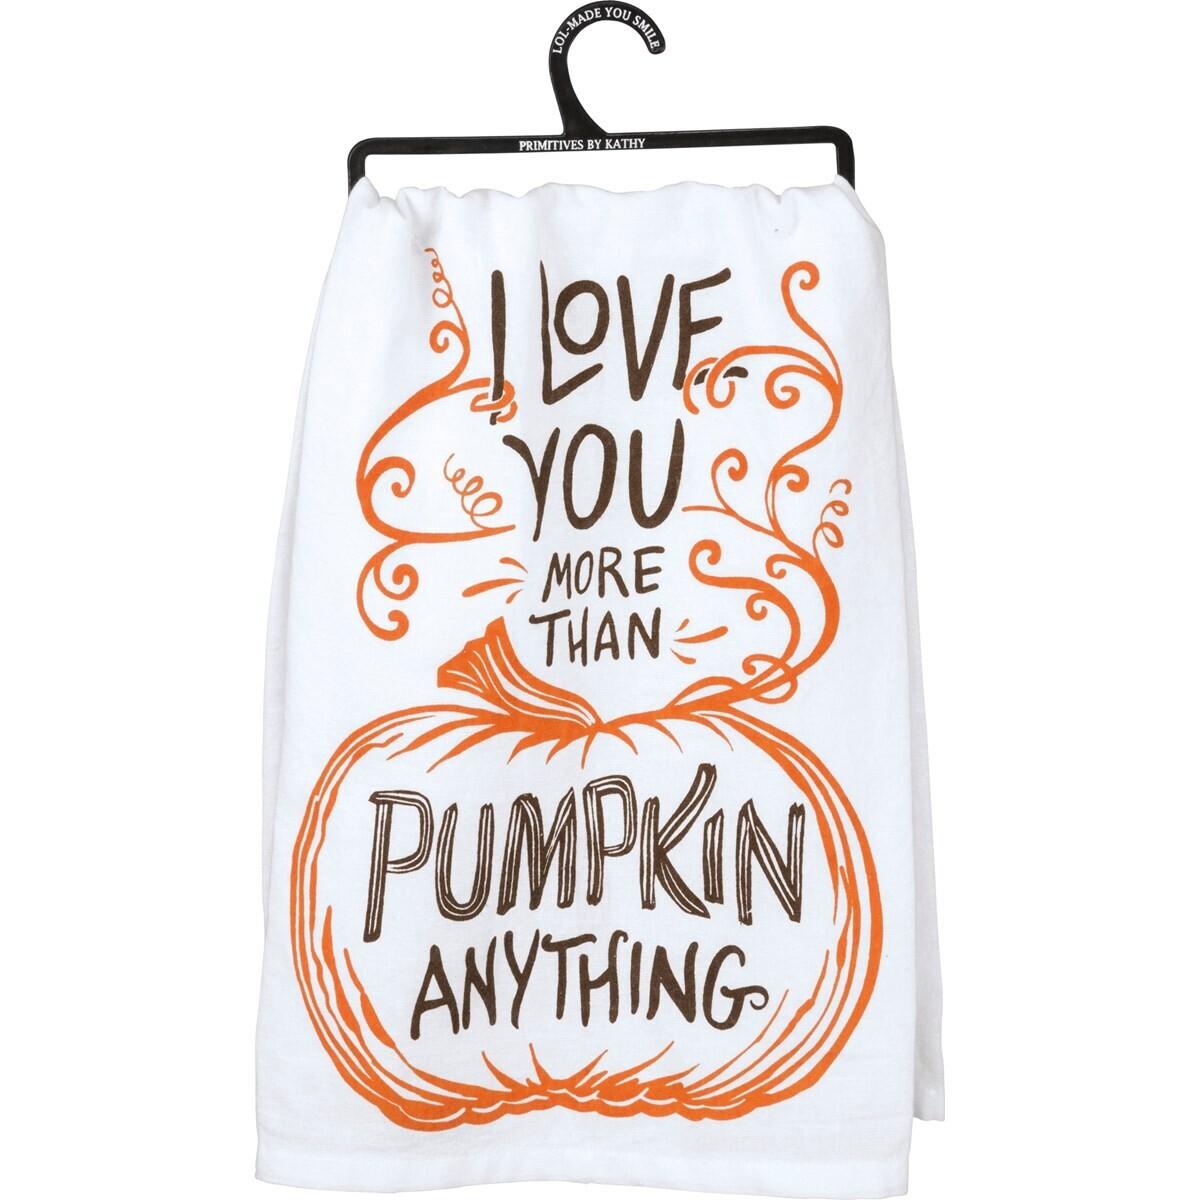 Pumpkin Anything Towel